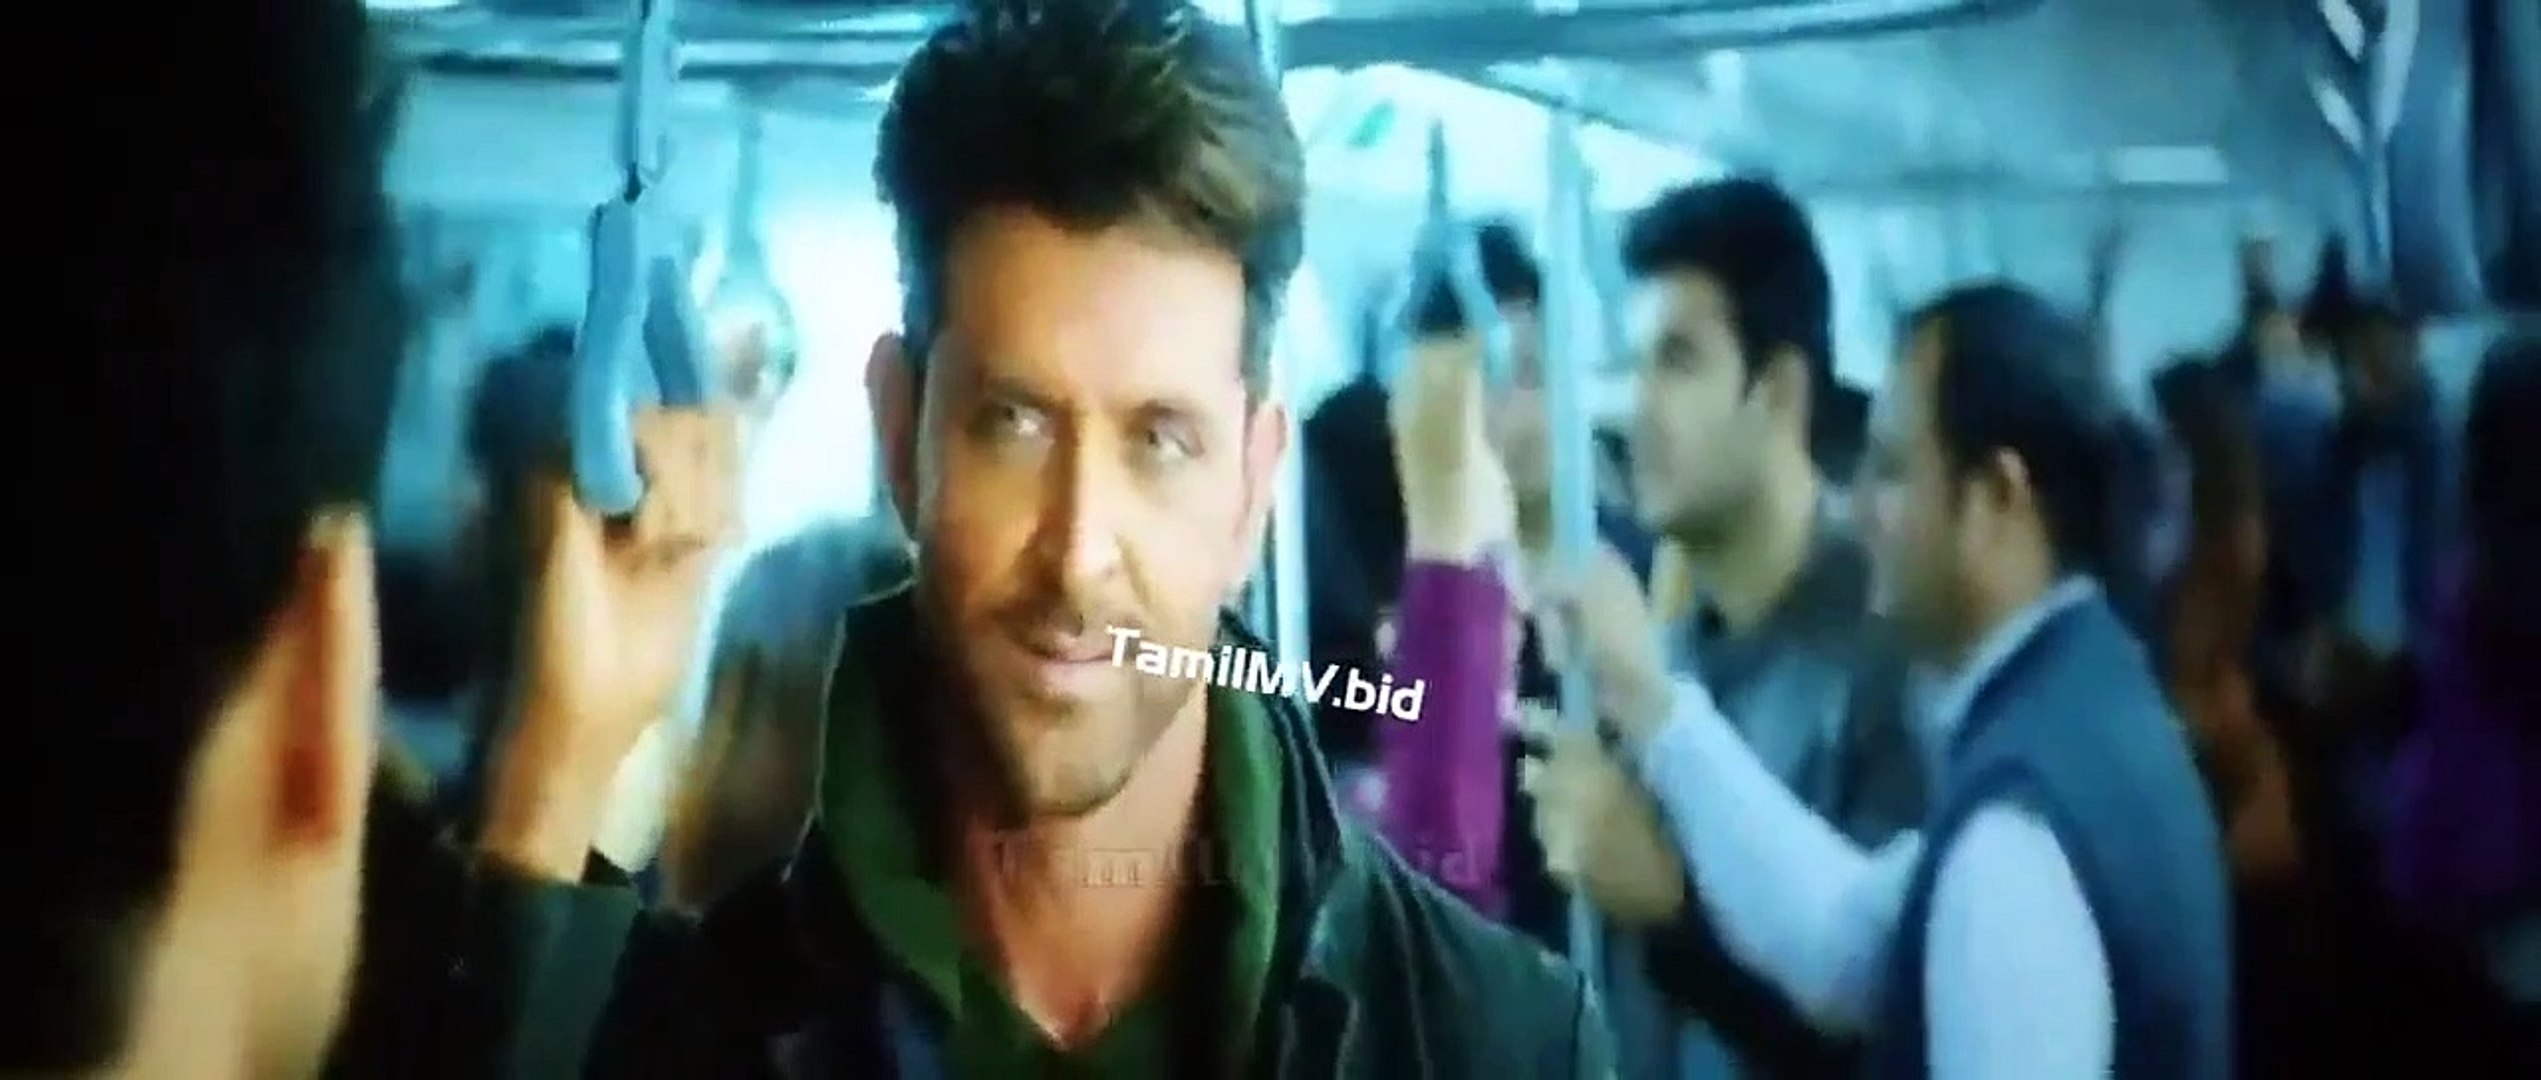 War (2019) Hindi Movie full Part 2 - 3